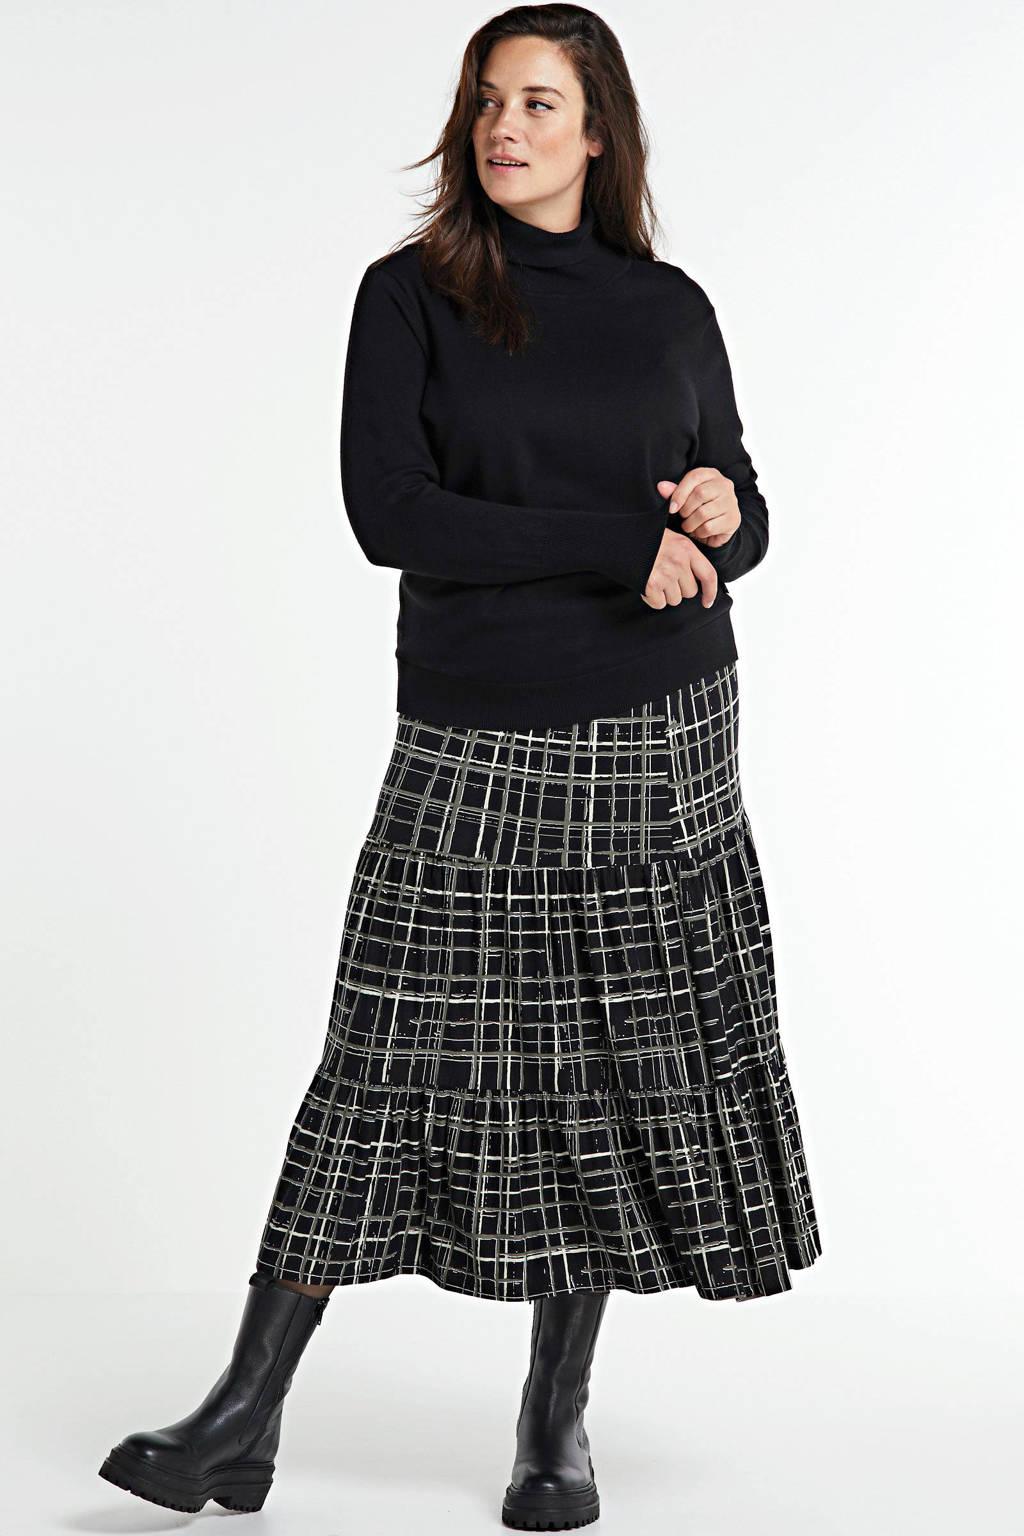 CHOISE geruite rok zwart/wit/grijs, Zwart/wit/grijs